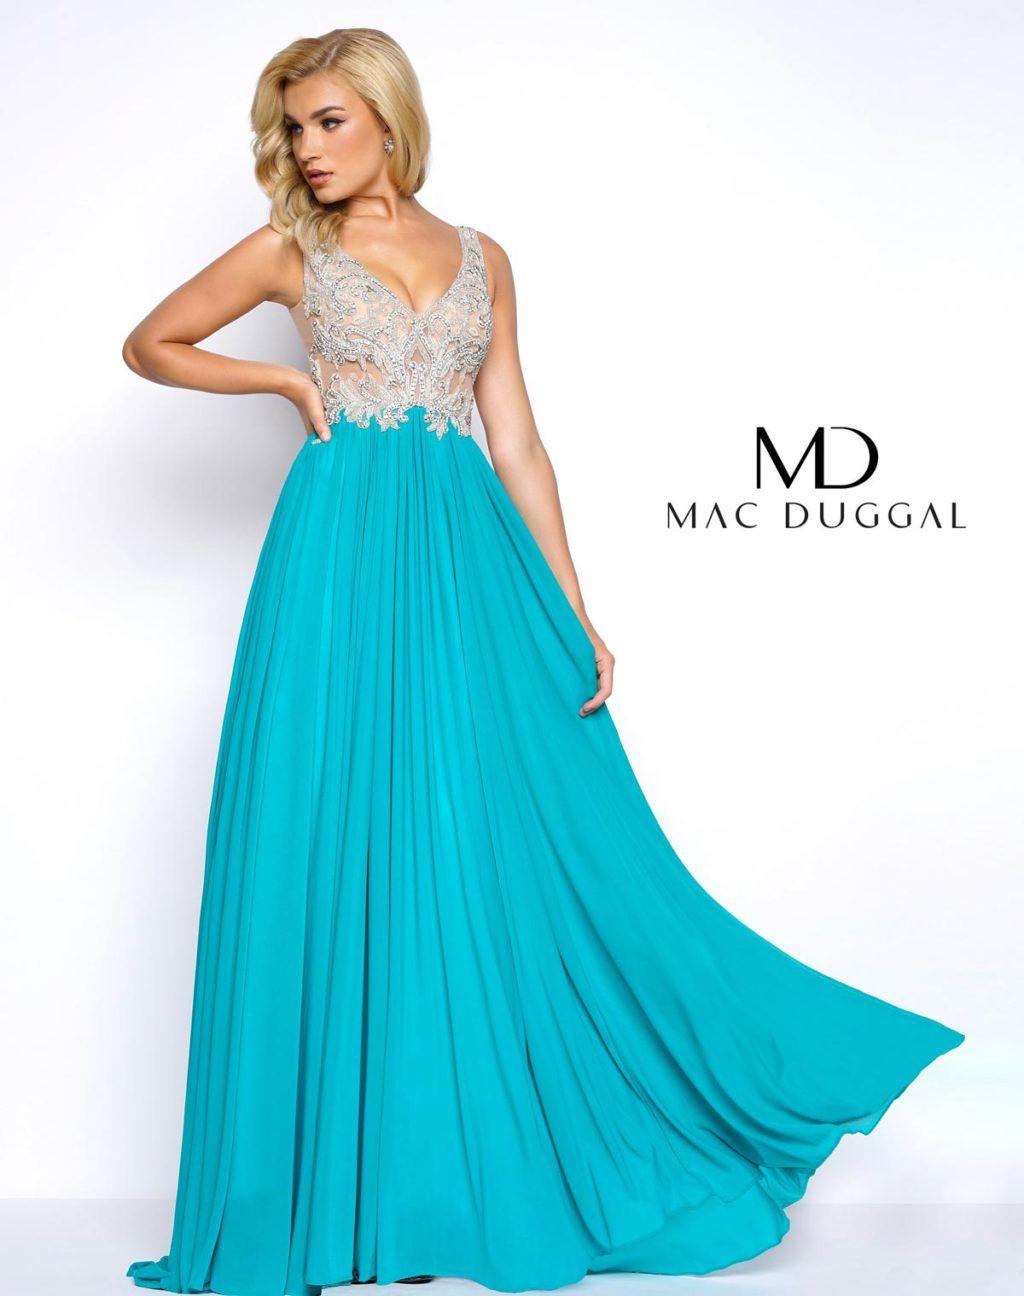 Teal Prom Dress | Prom | Pinterest | Prom, Designer prom dresses ...